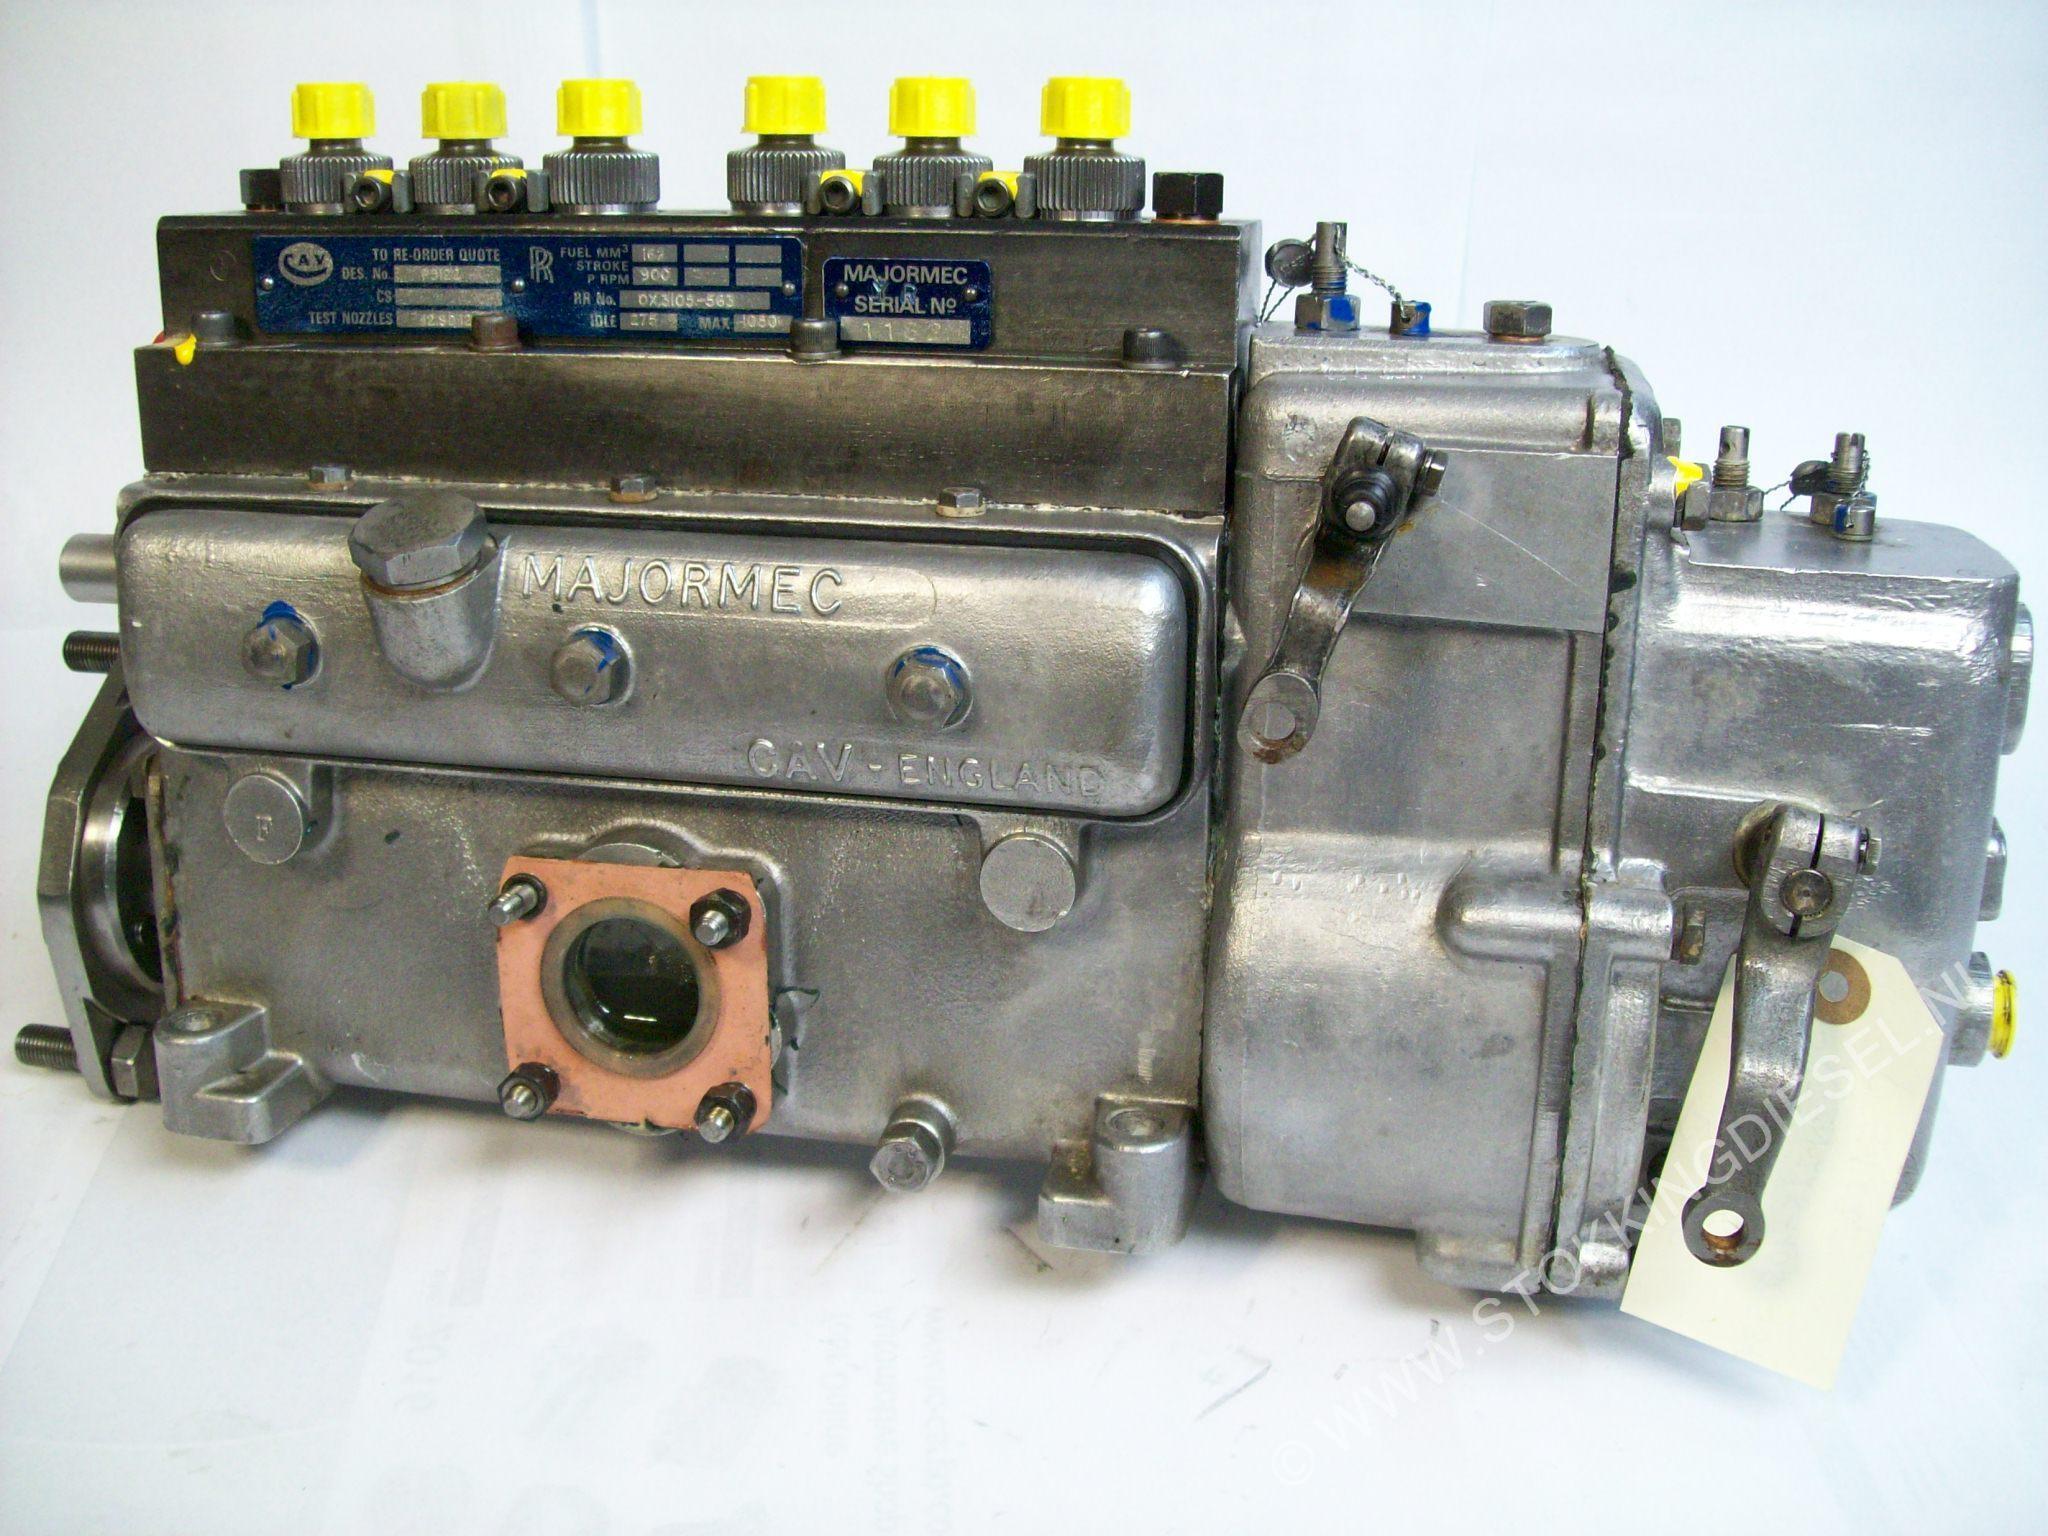 Search Results - simms - Dieselservice Stokking BV - gespecialiseerd